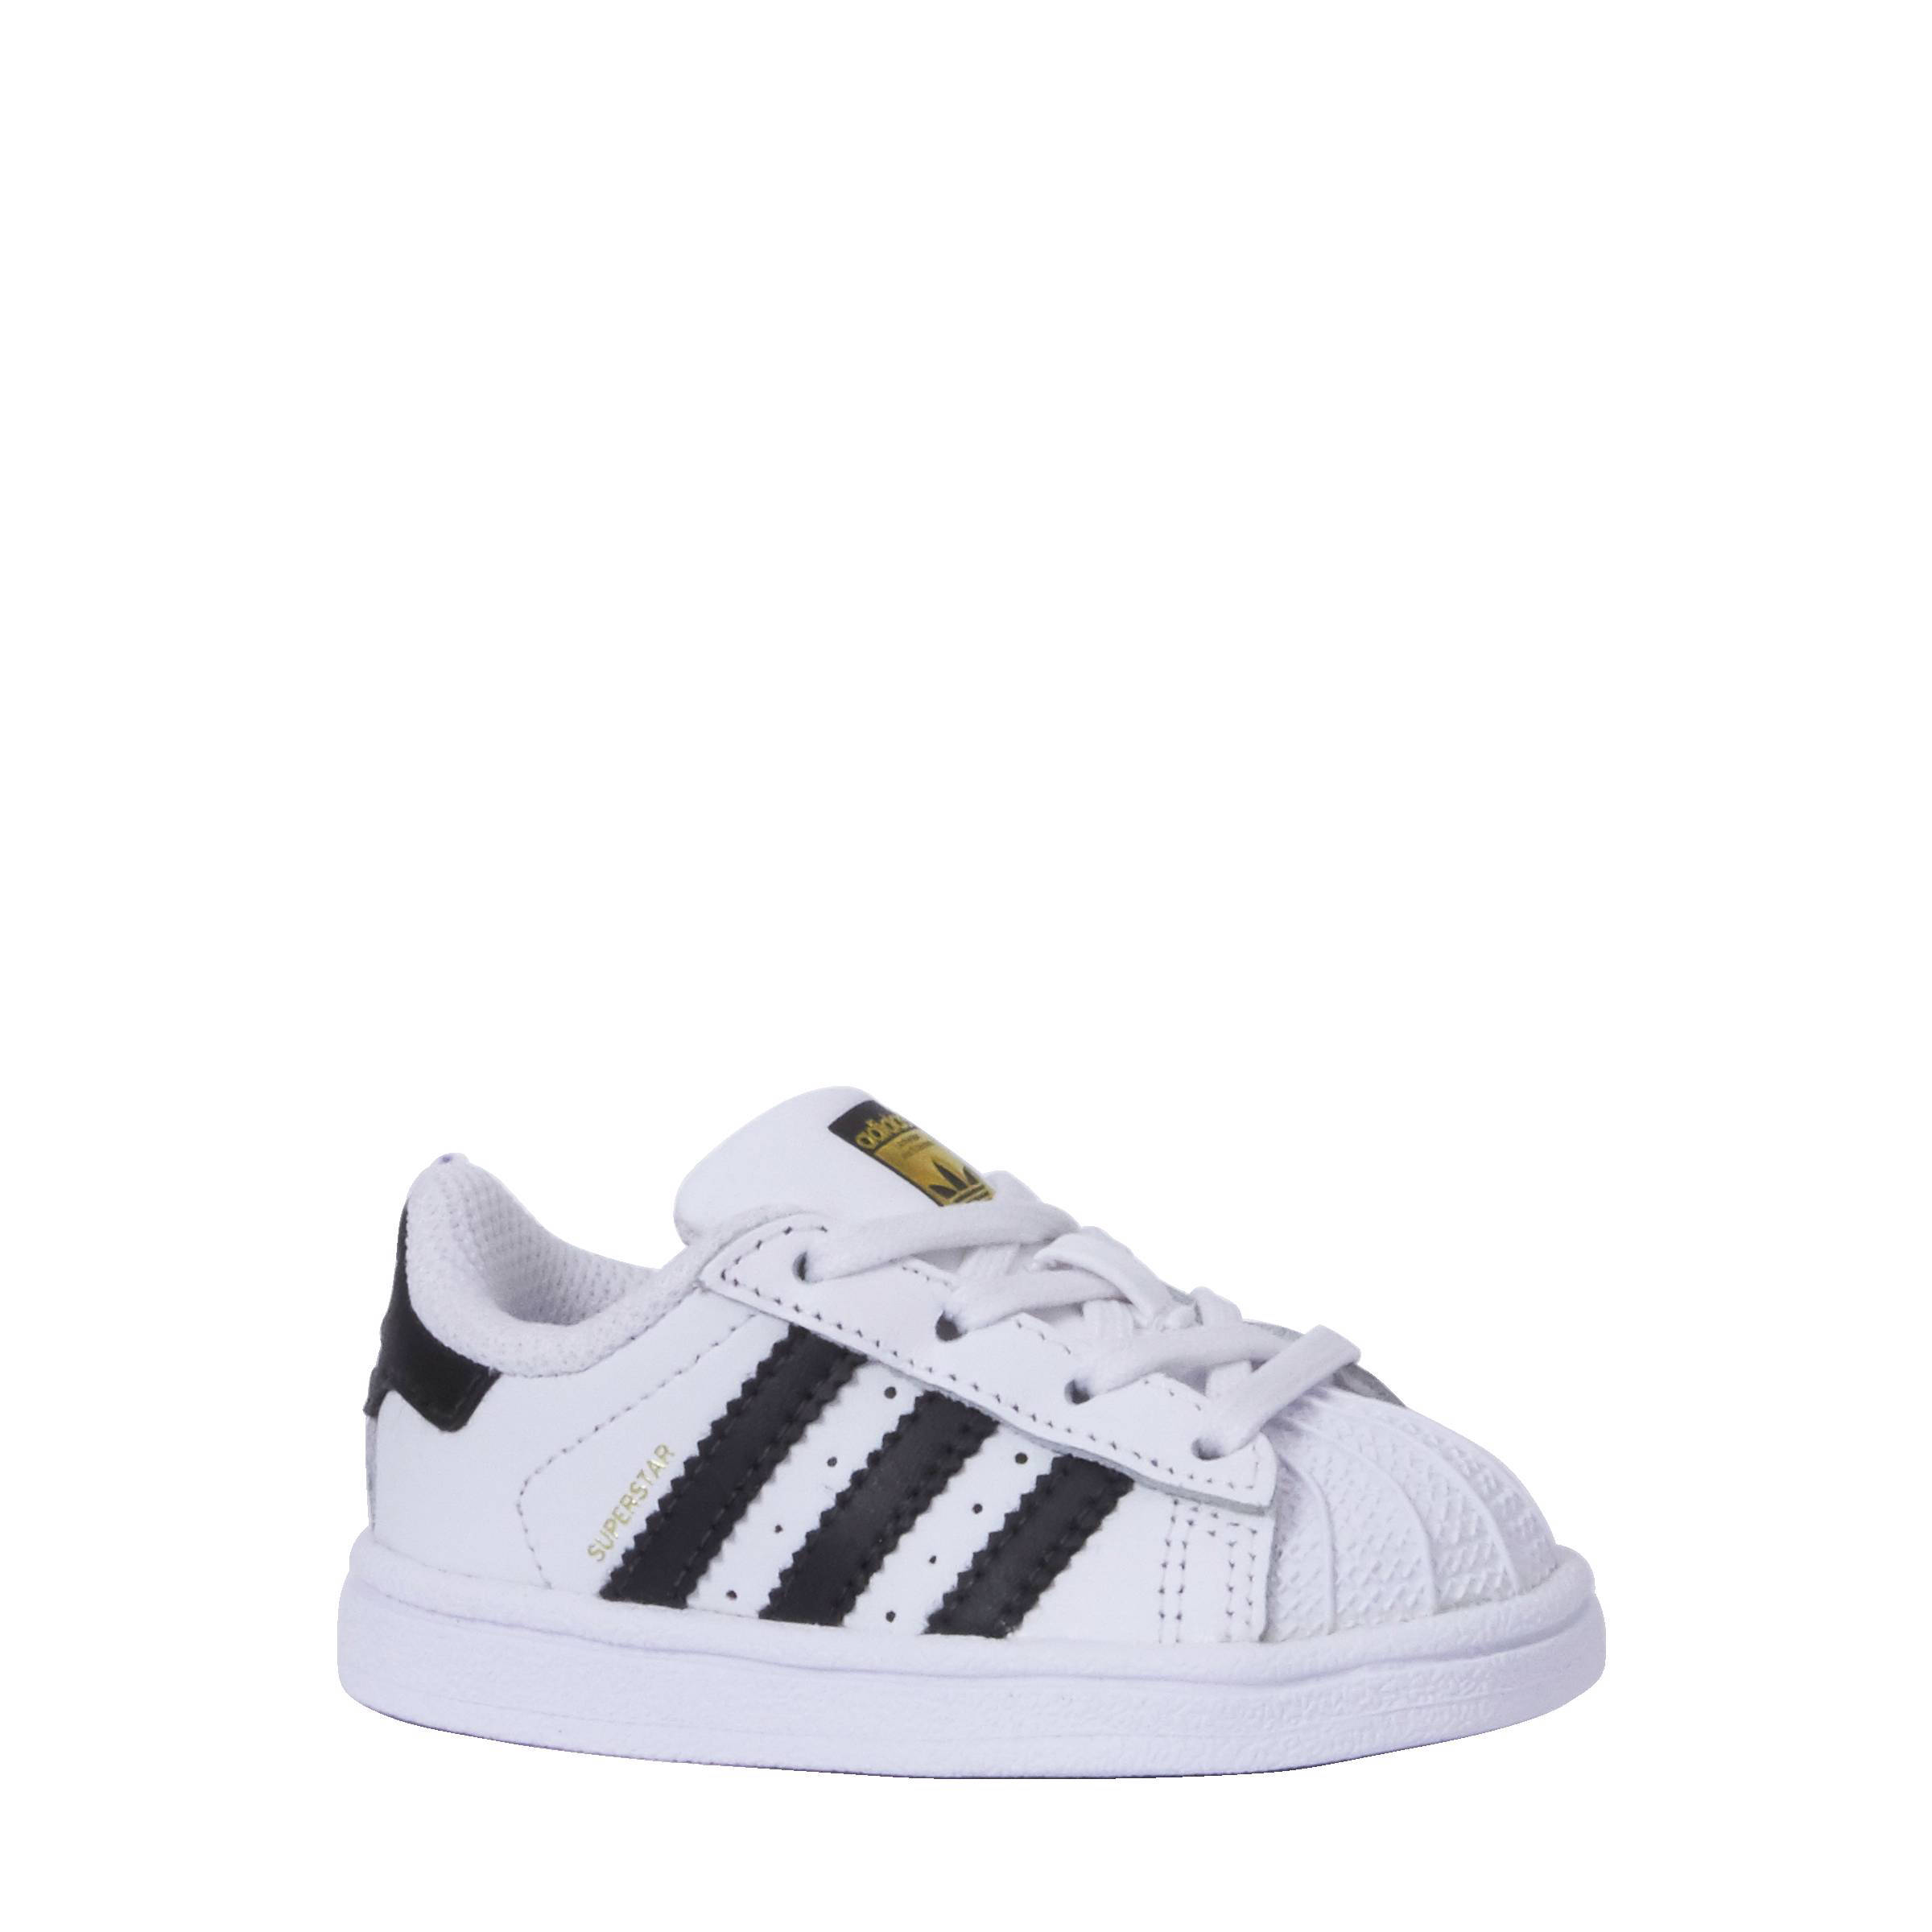 Superstar I sneakers